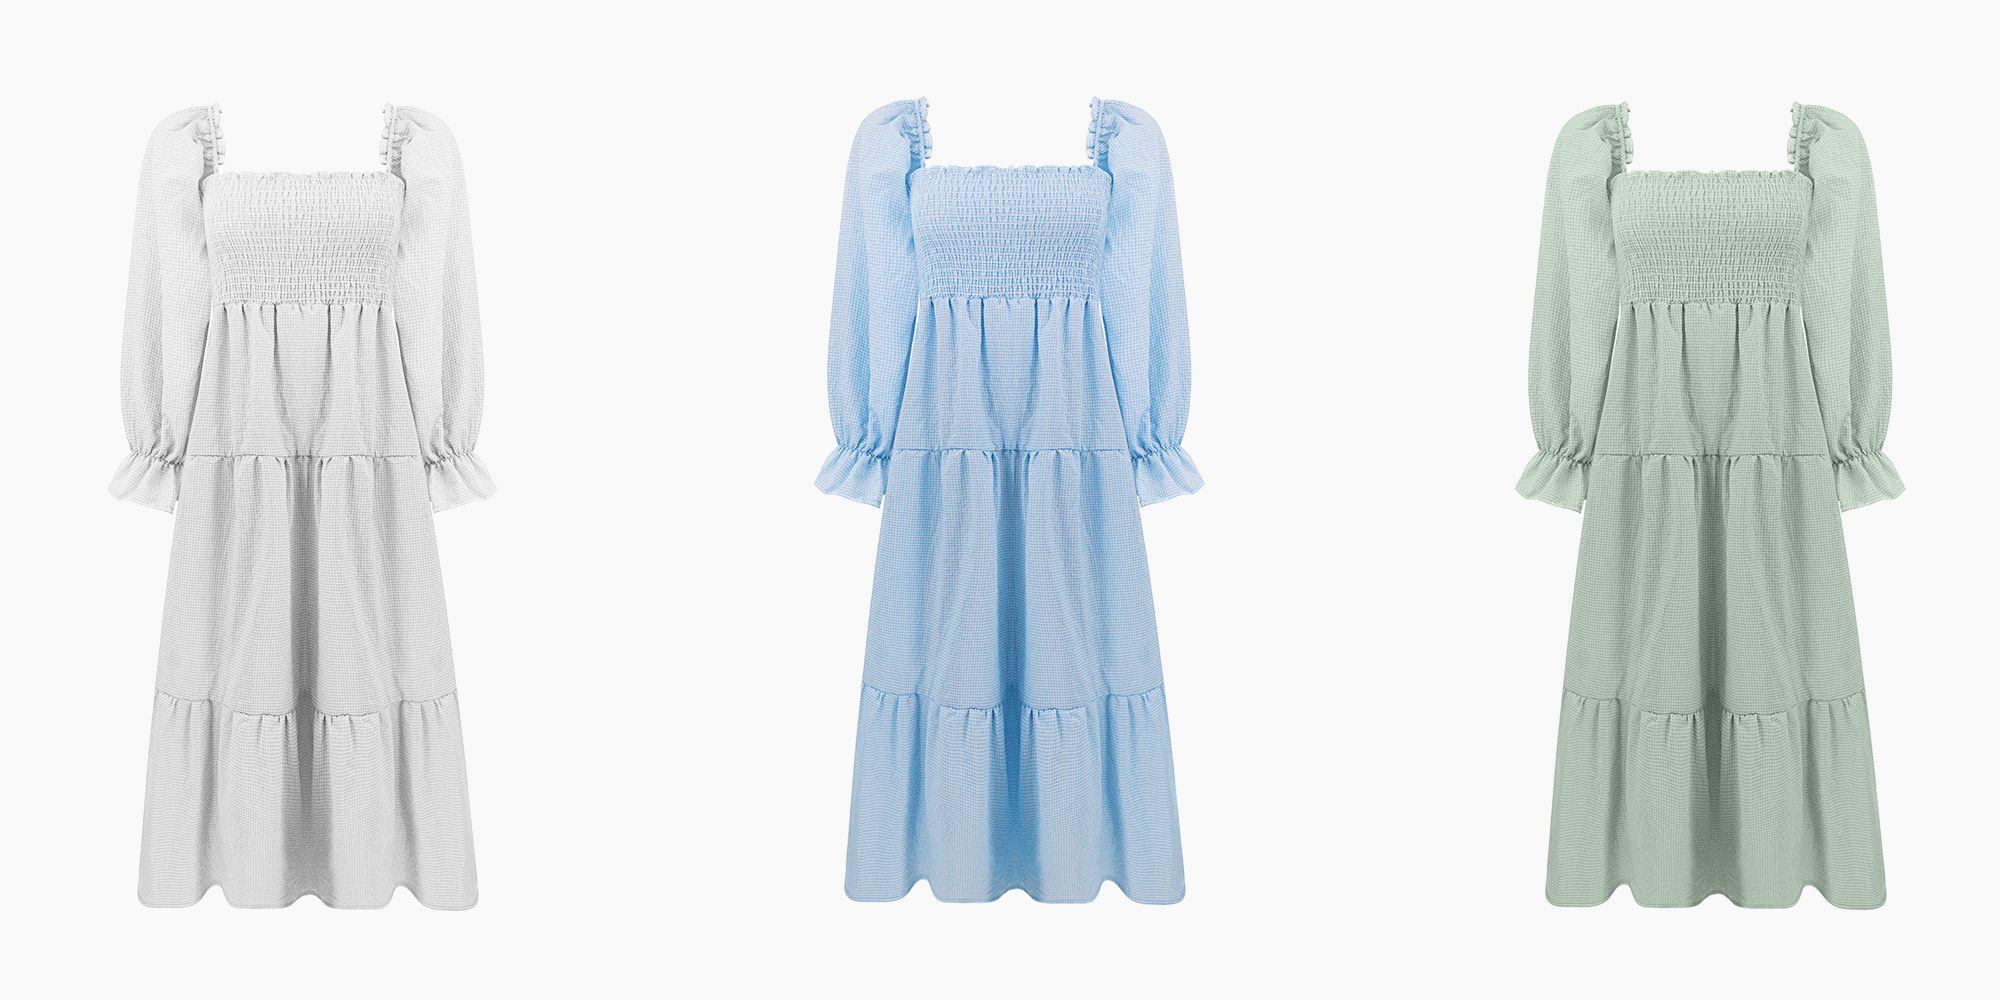 This $25 Amazon Dress is Going Viral on TikTok